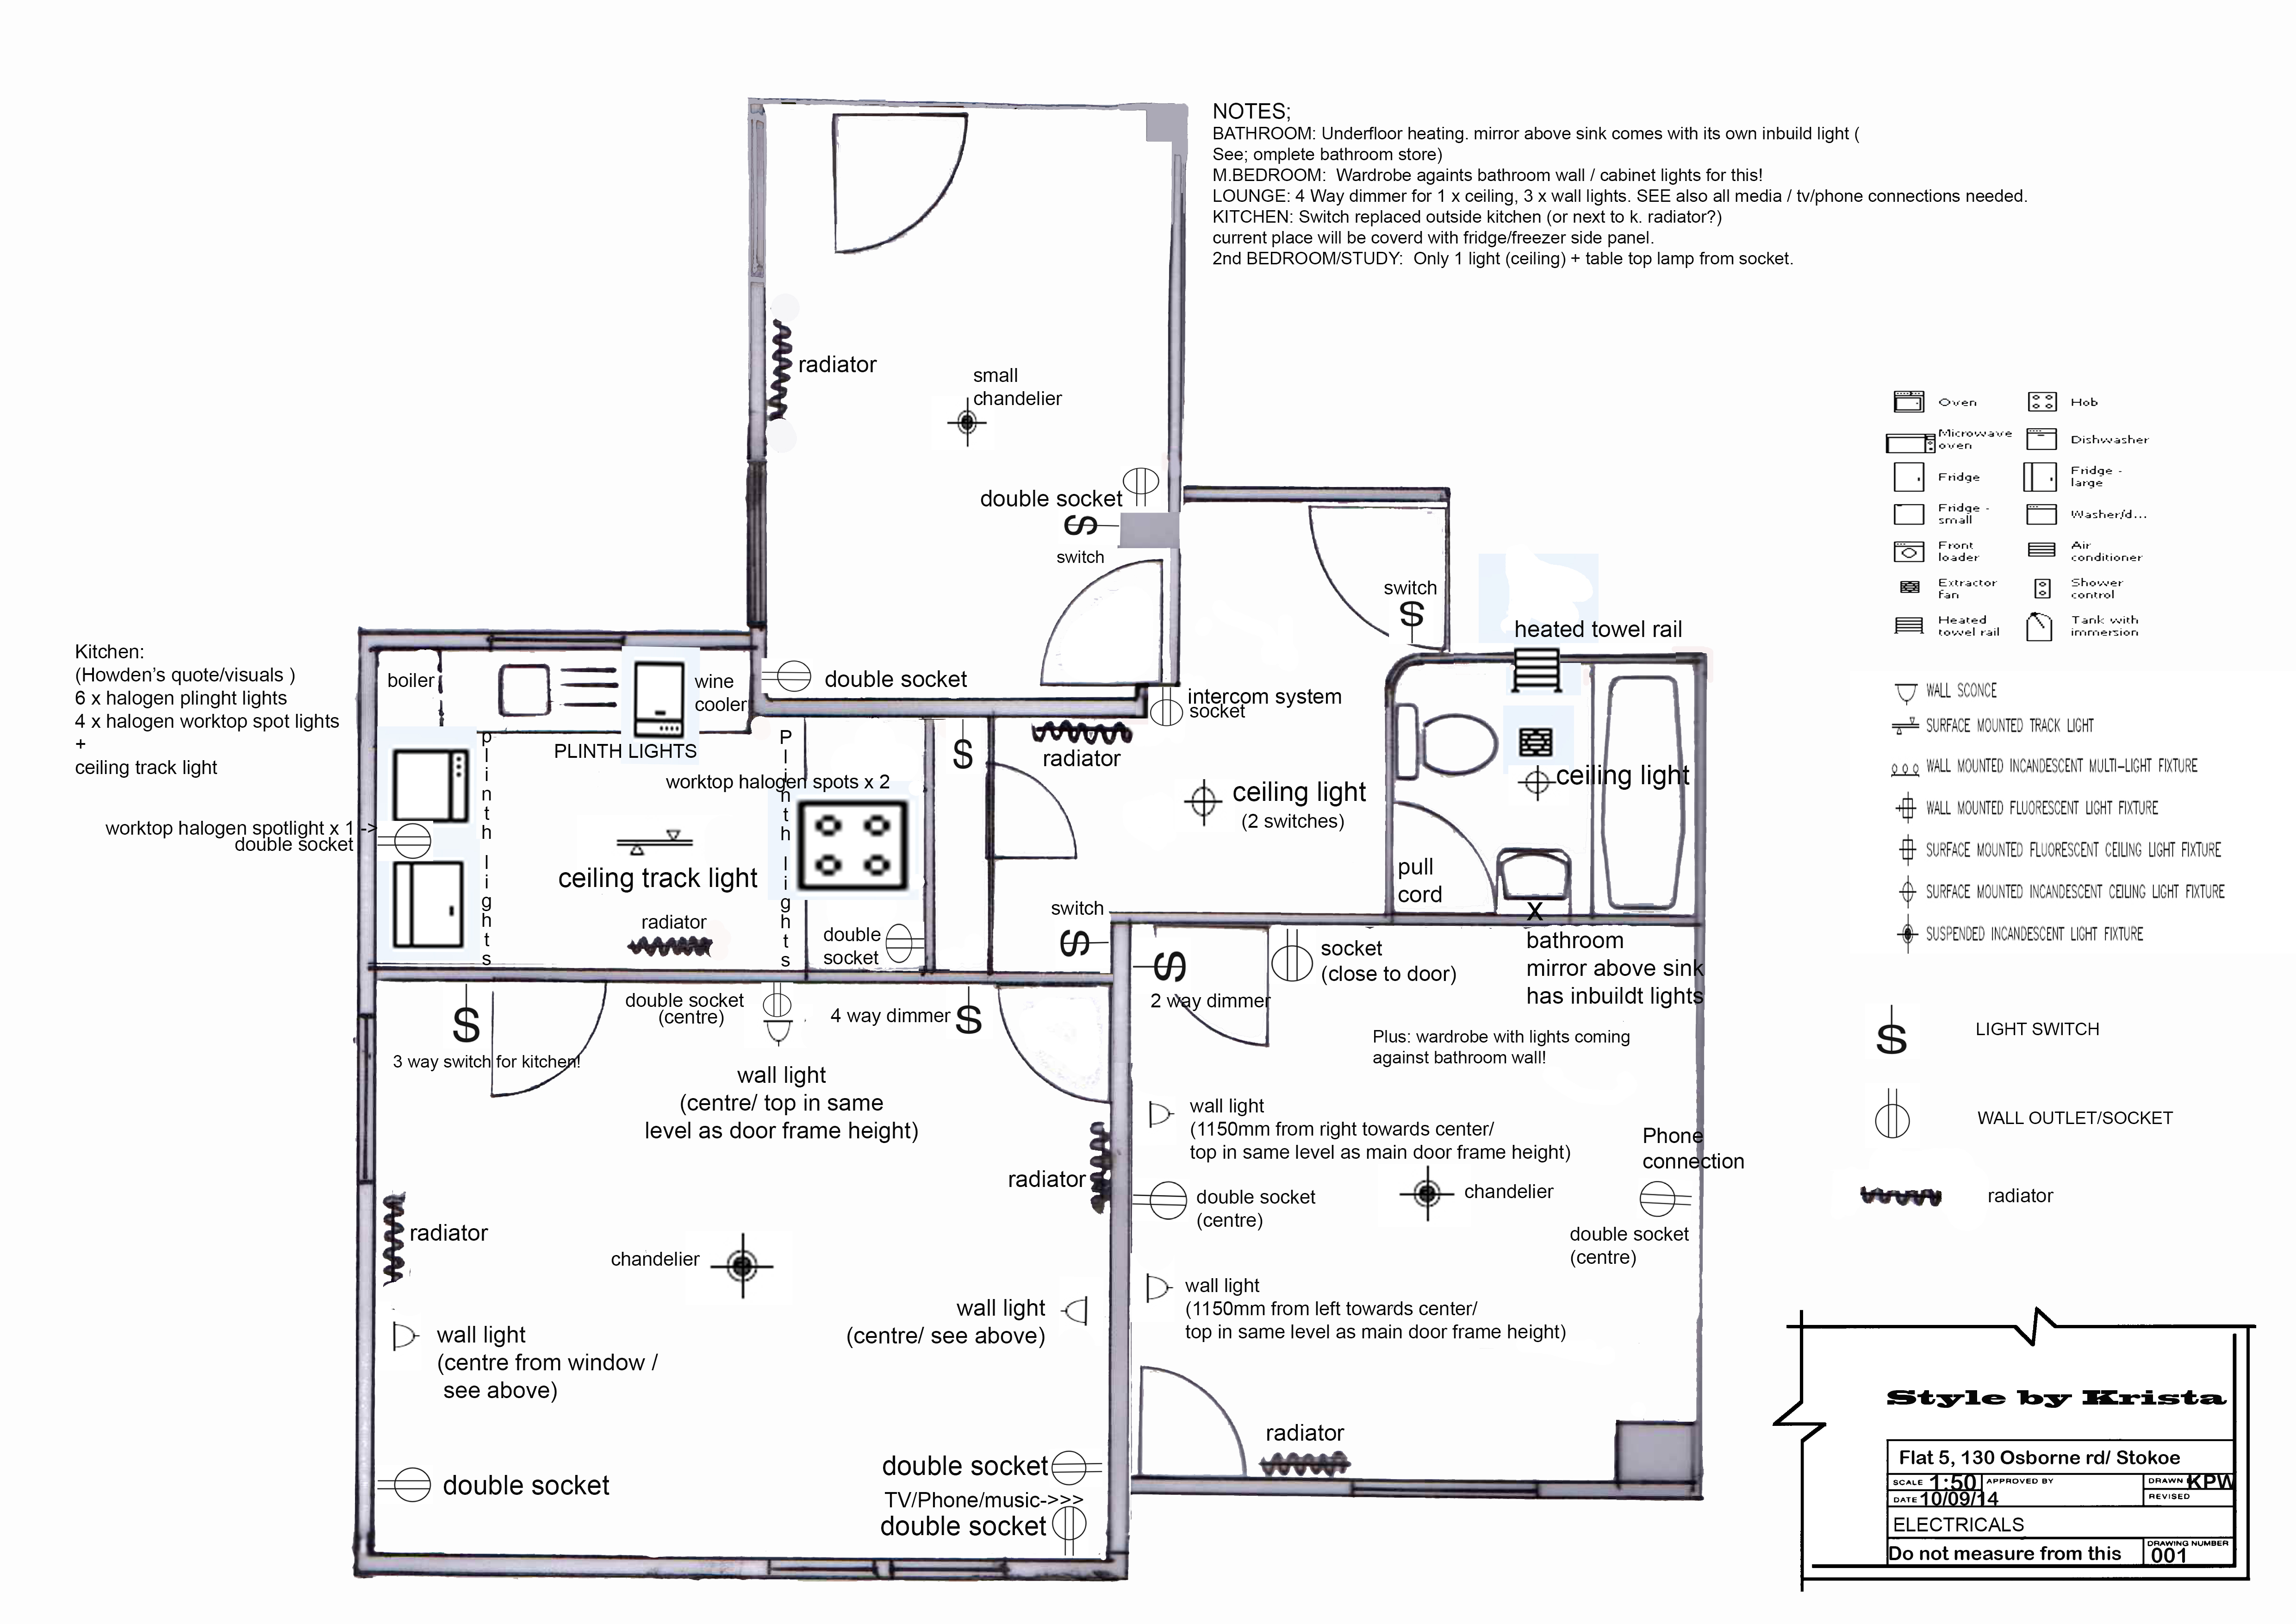 Electrical Plan Residential - Merzie.net